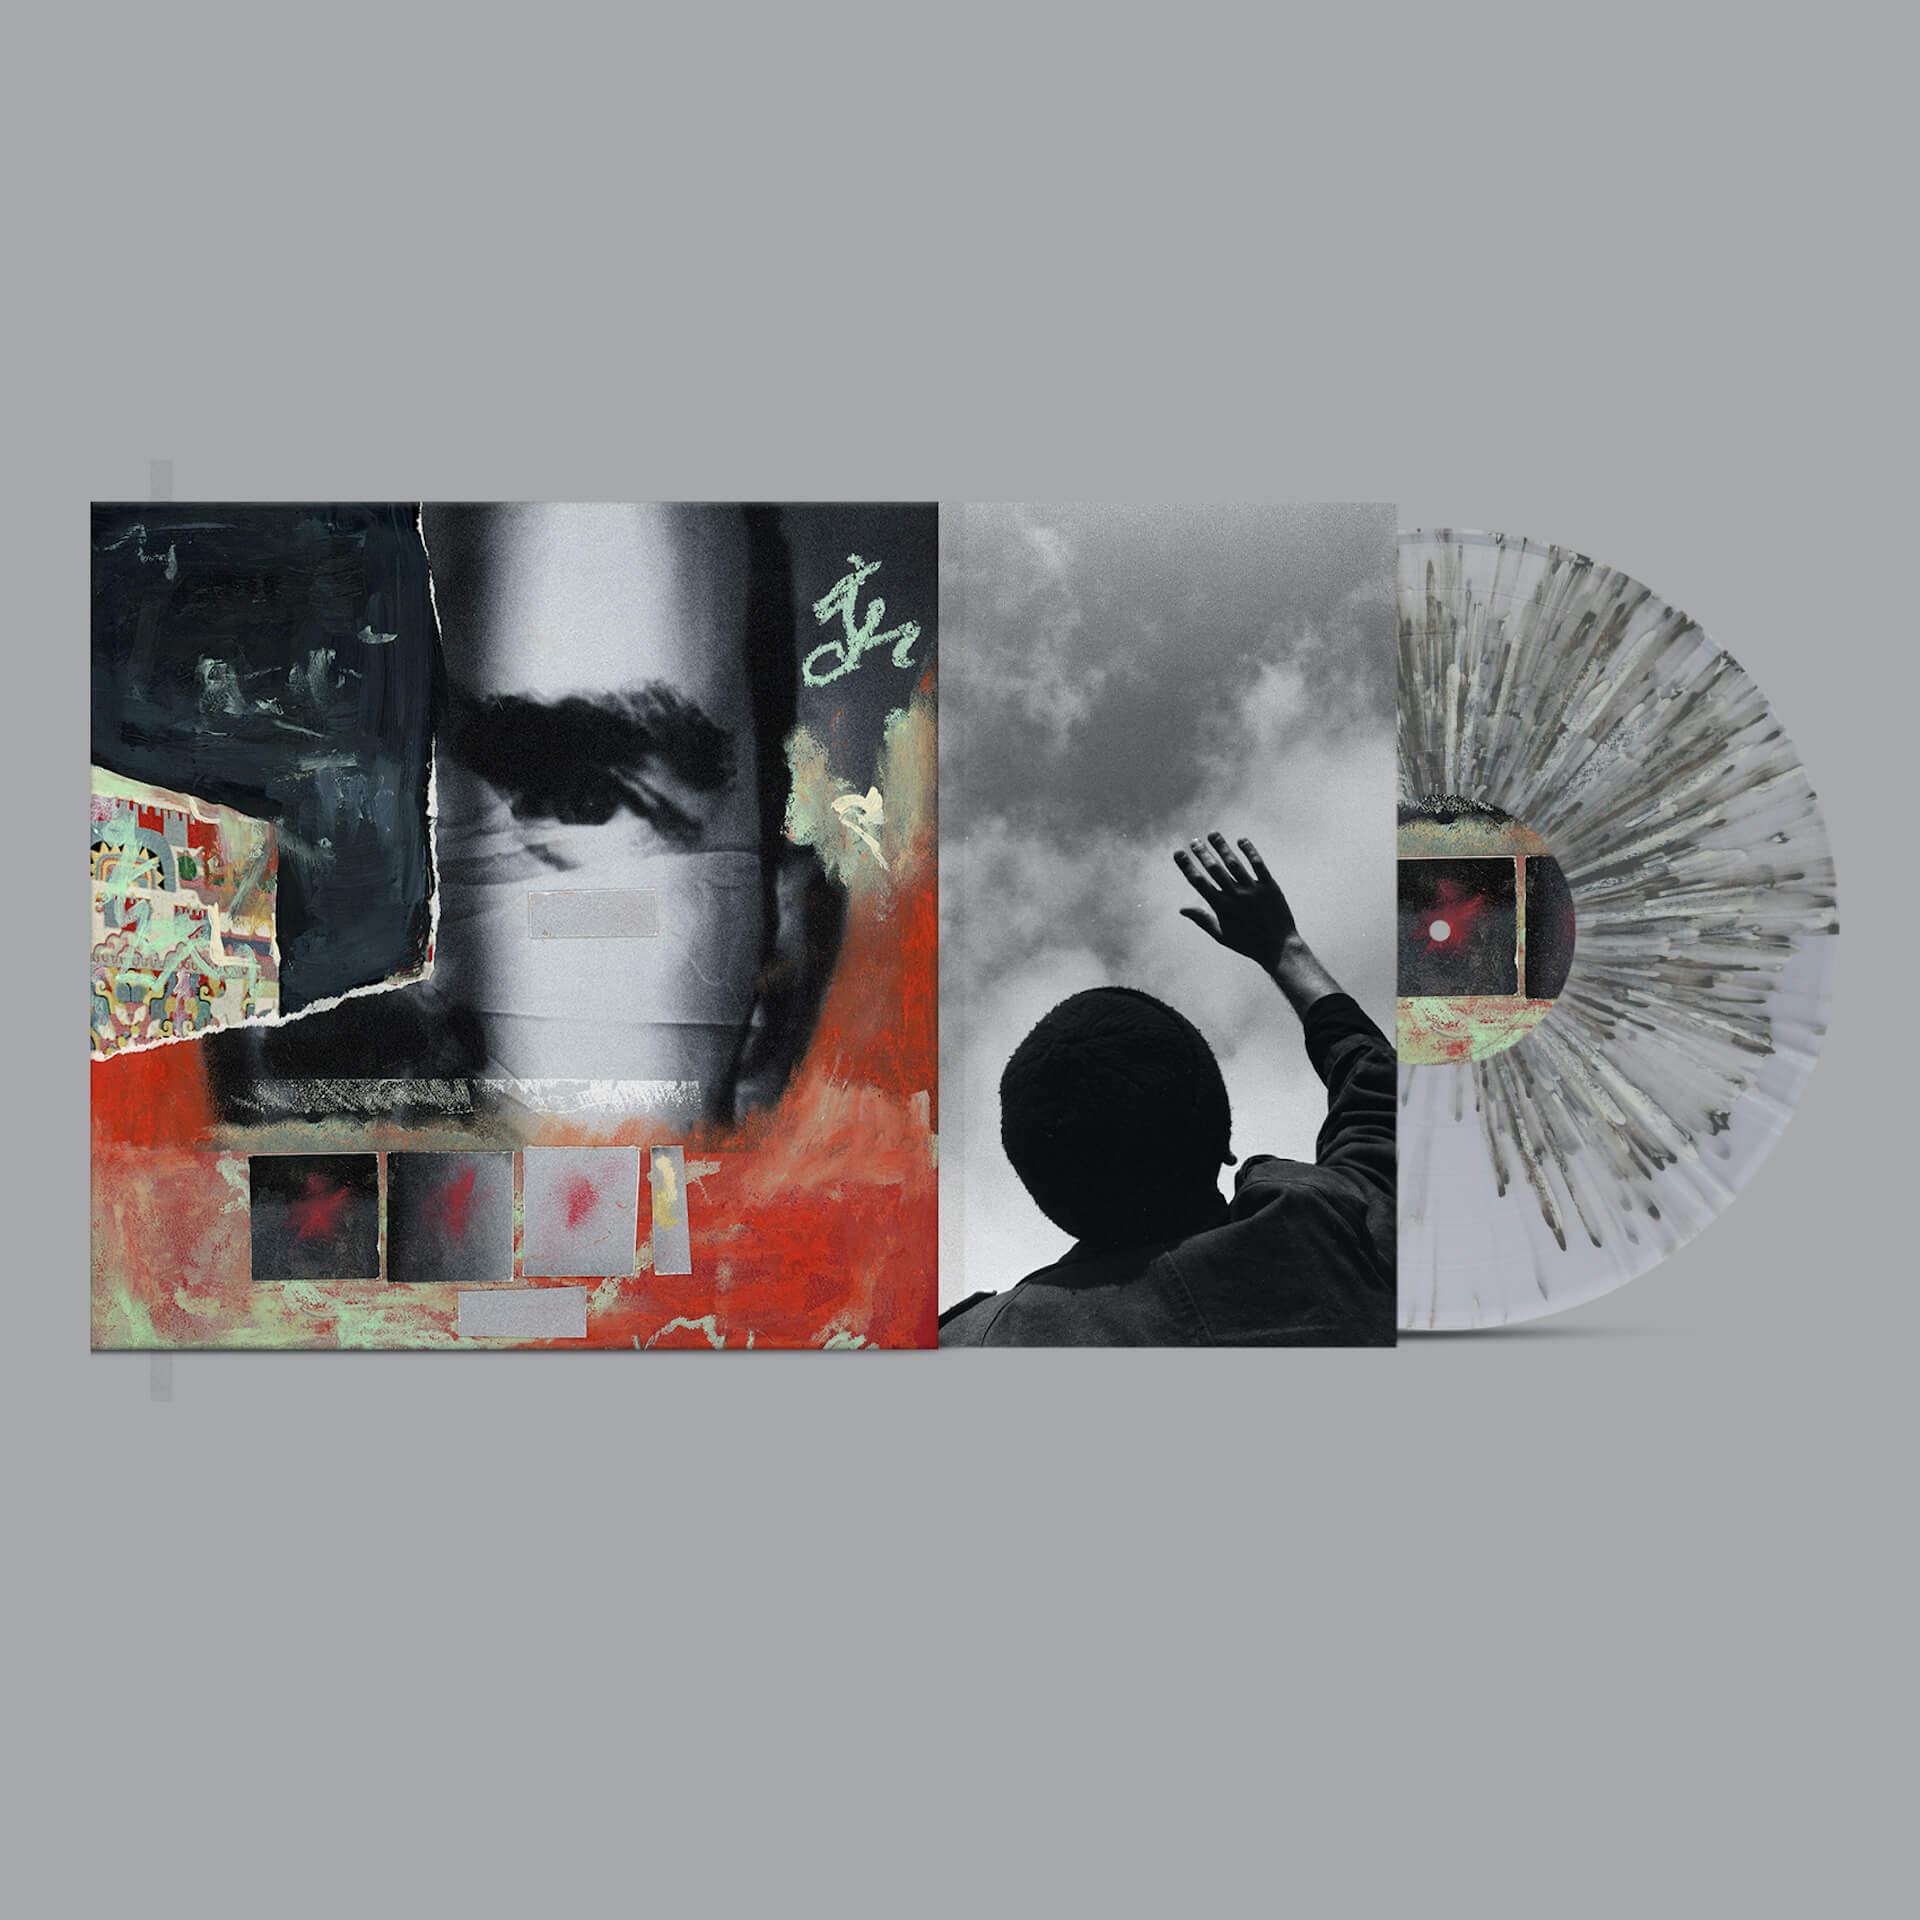 "Jordan Rakeiが〈Ninja Tune〉より最新作『What We Call Life』をリリース決定!新曲""Family""も公開 music210623_jordan_rakei6"